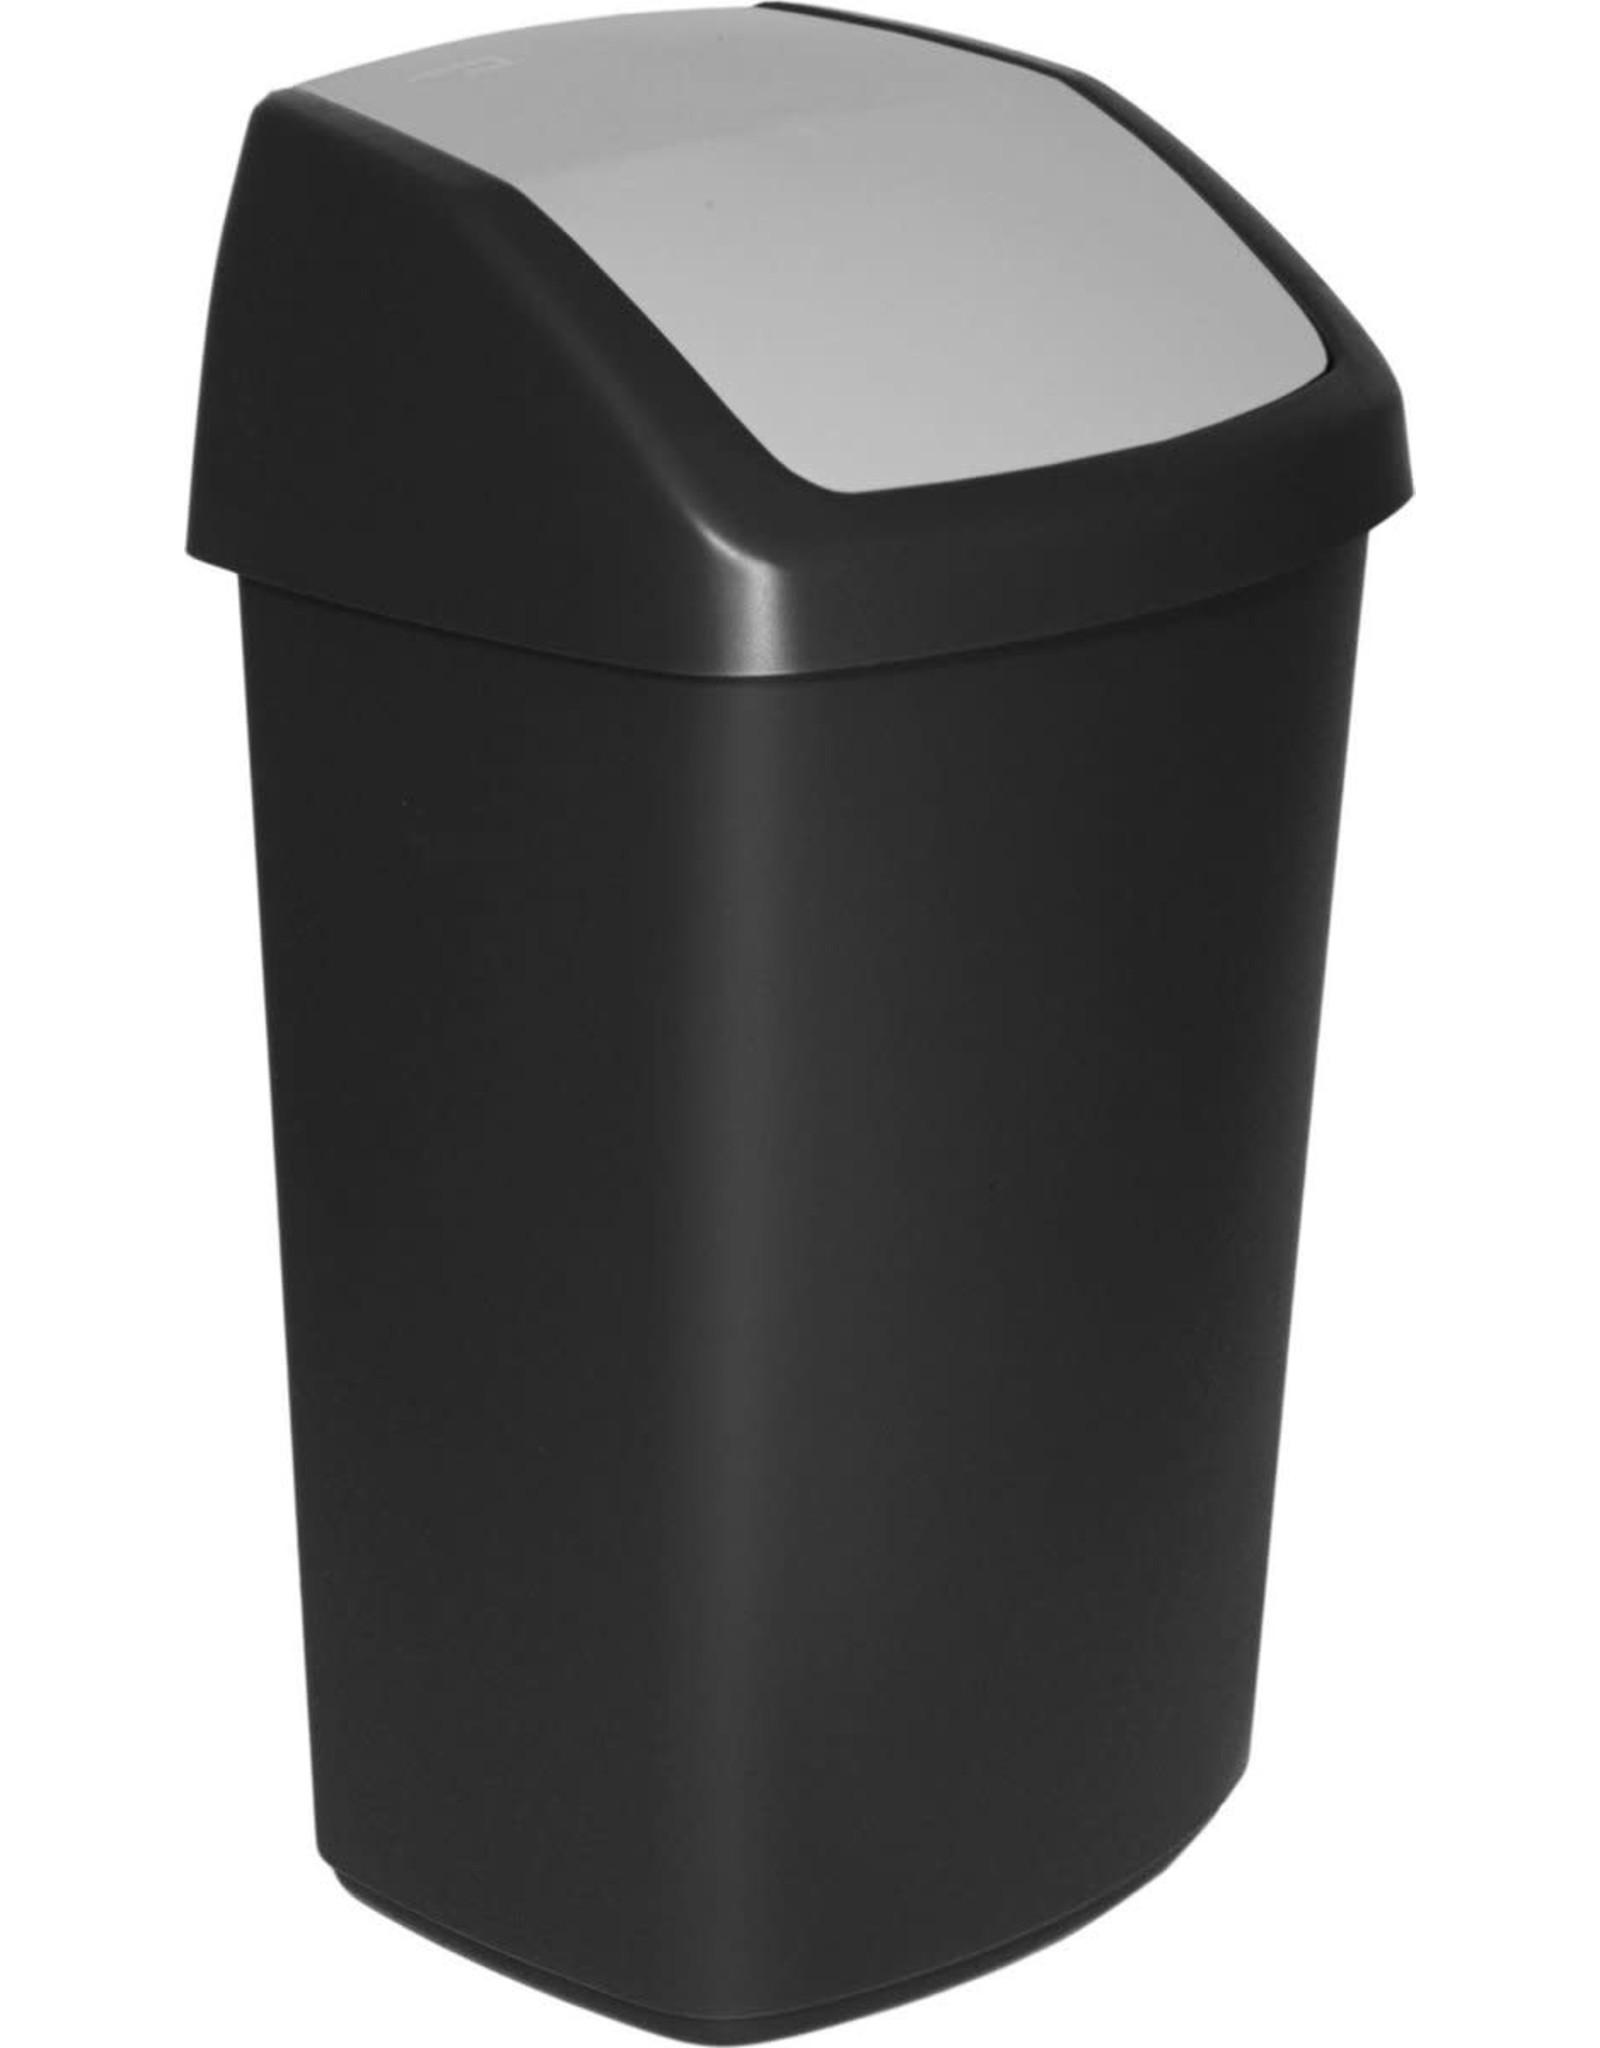 CURVER Curver afvalbak Swing 50L zwart/grijs